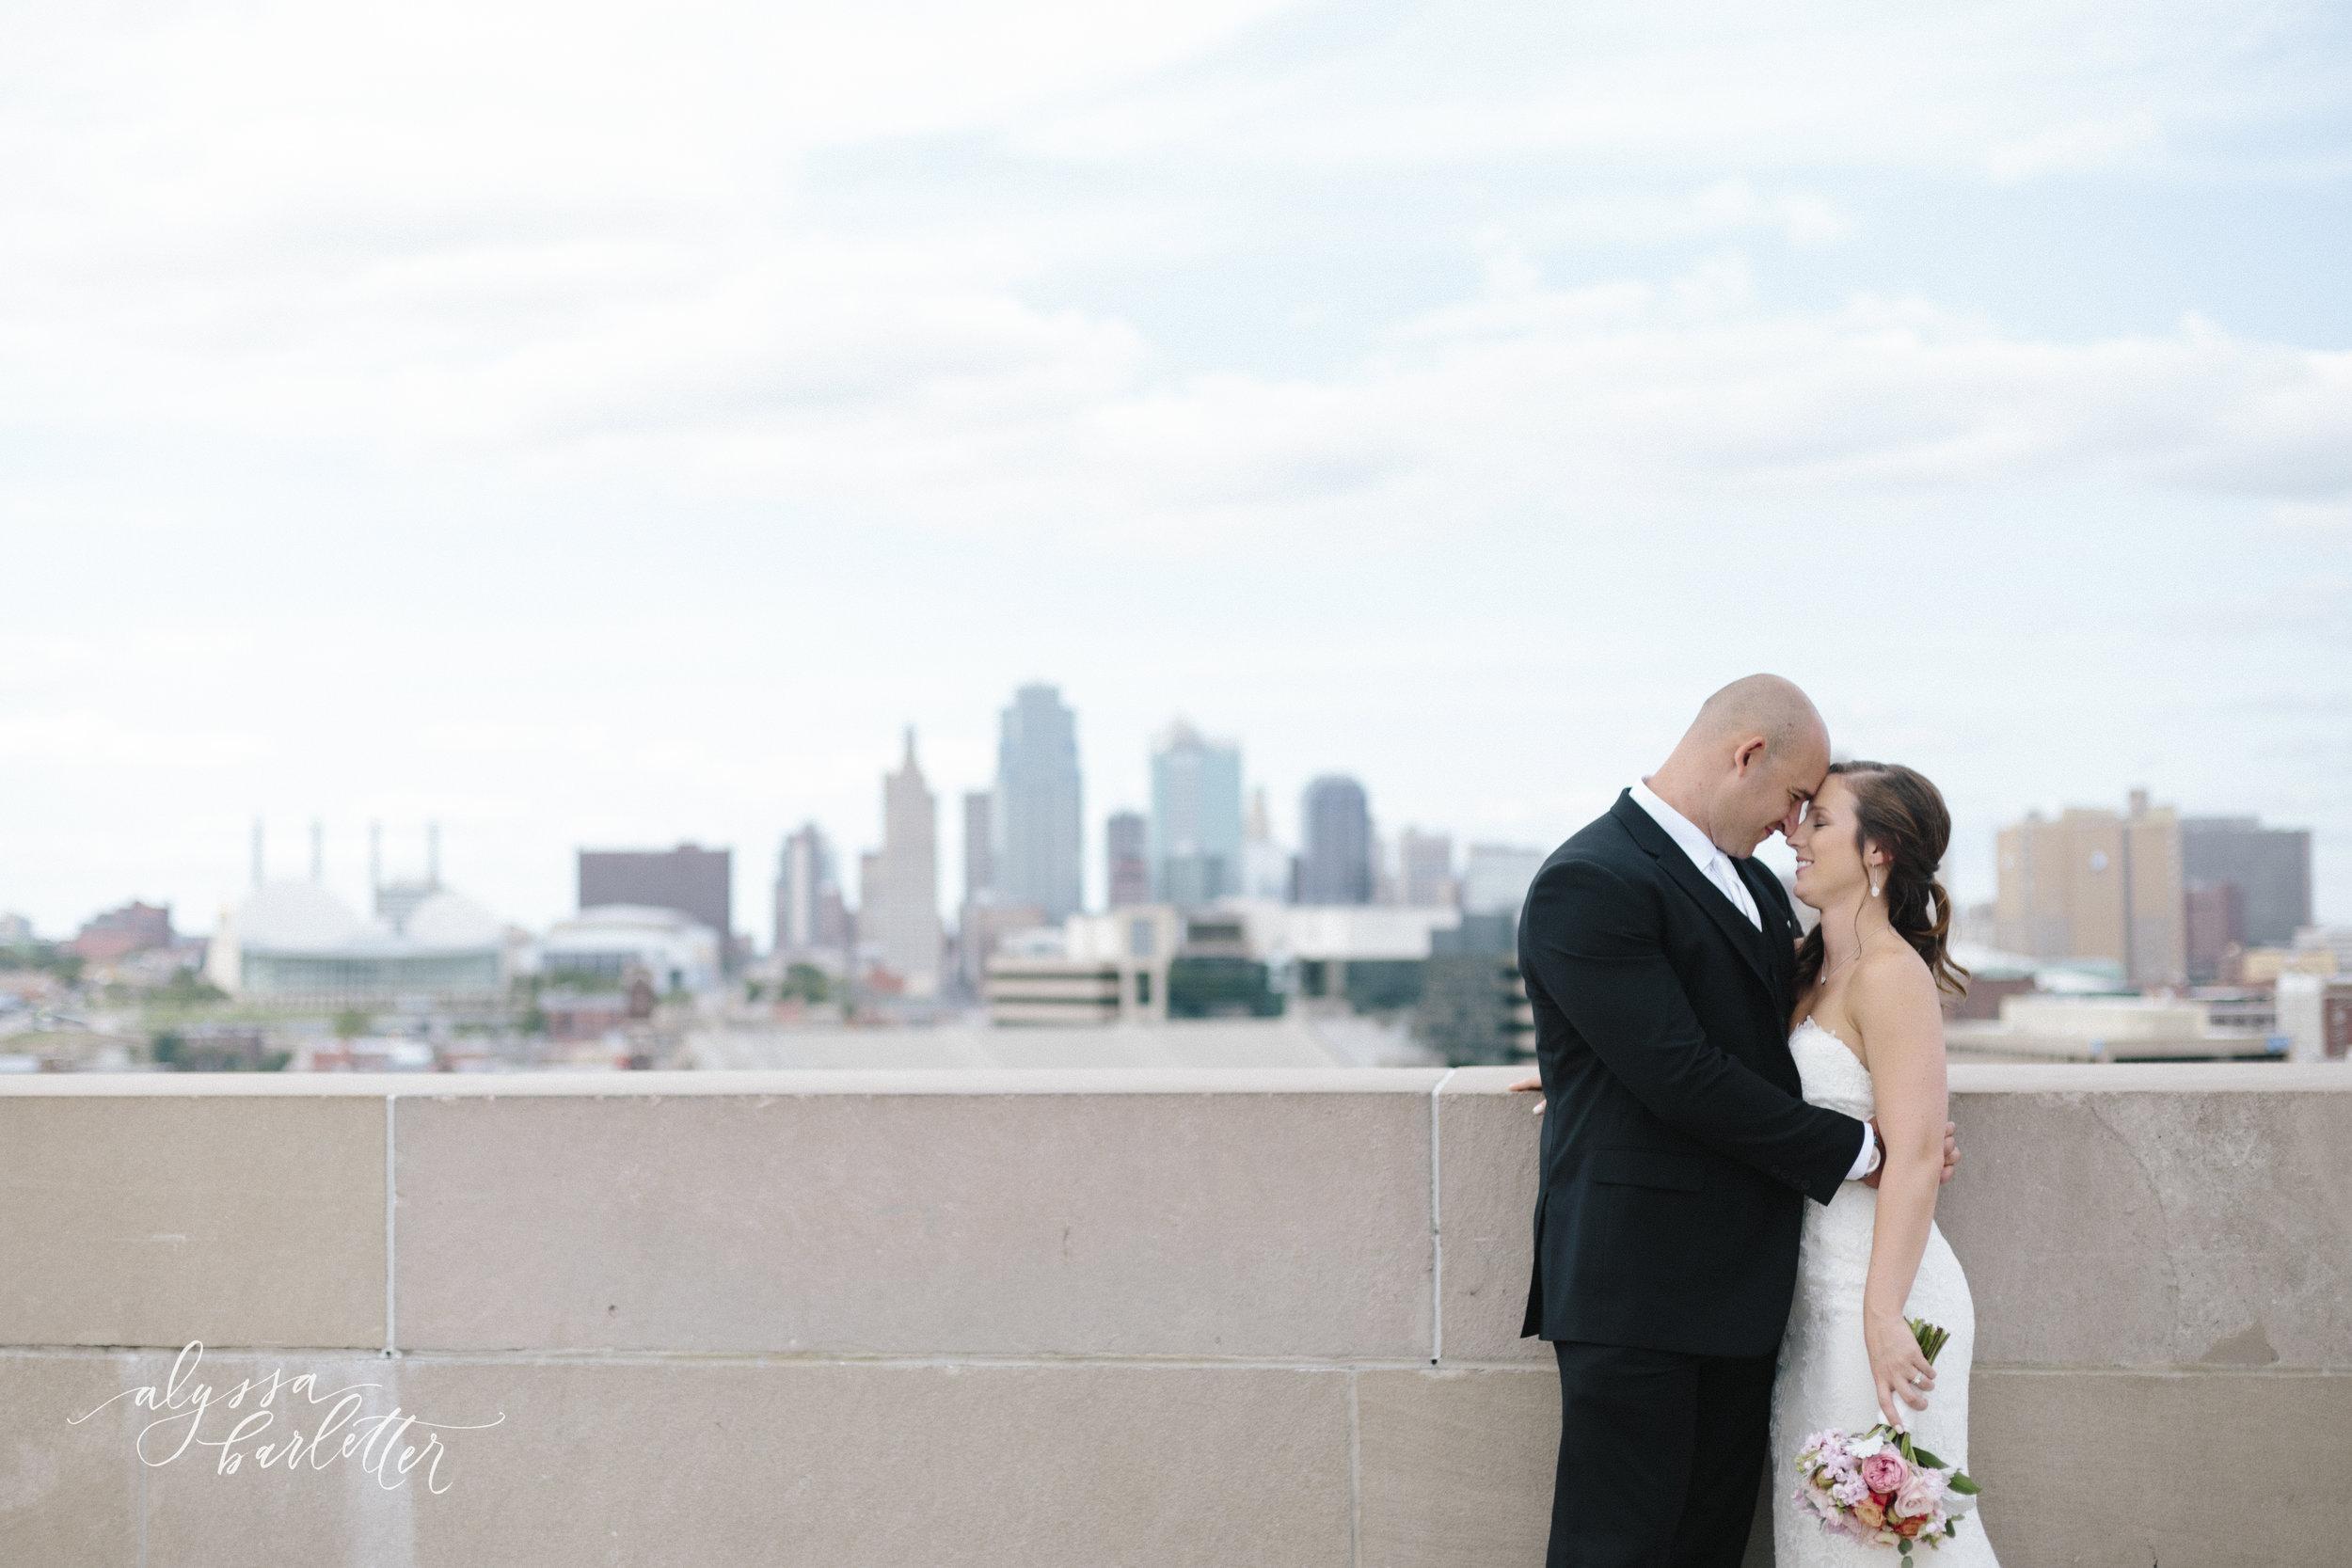 kansas city wedding photography wwi liberty memorial skyline bride groom